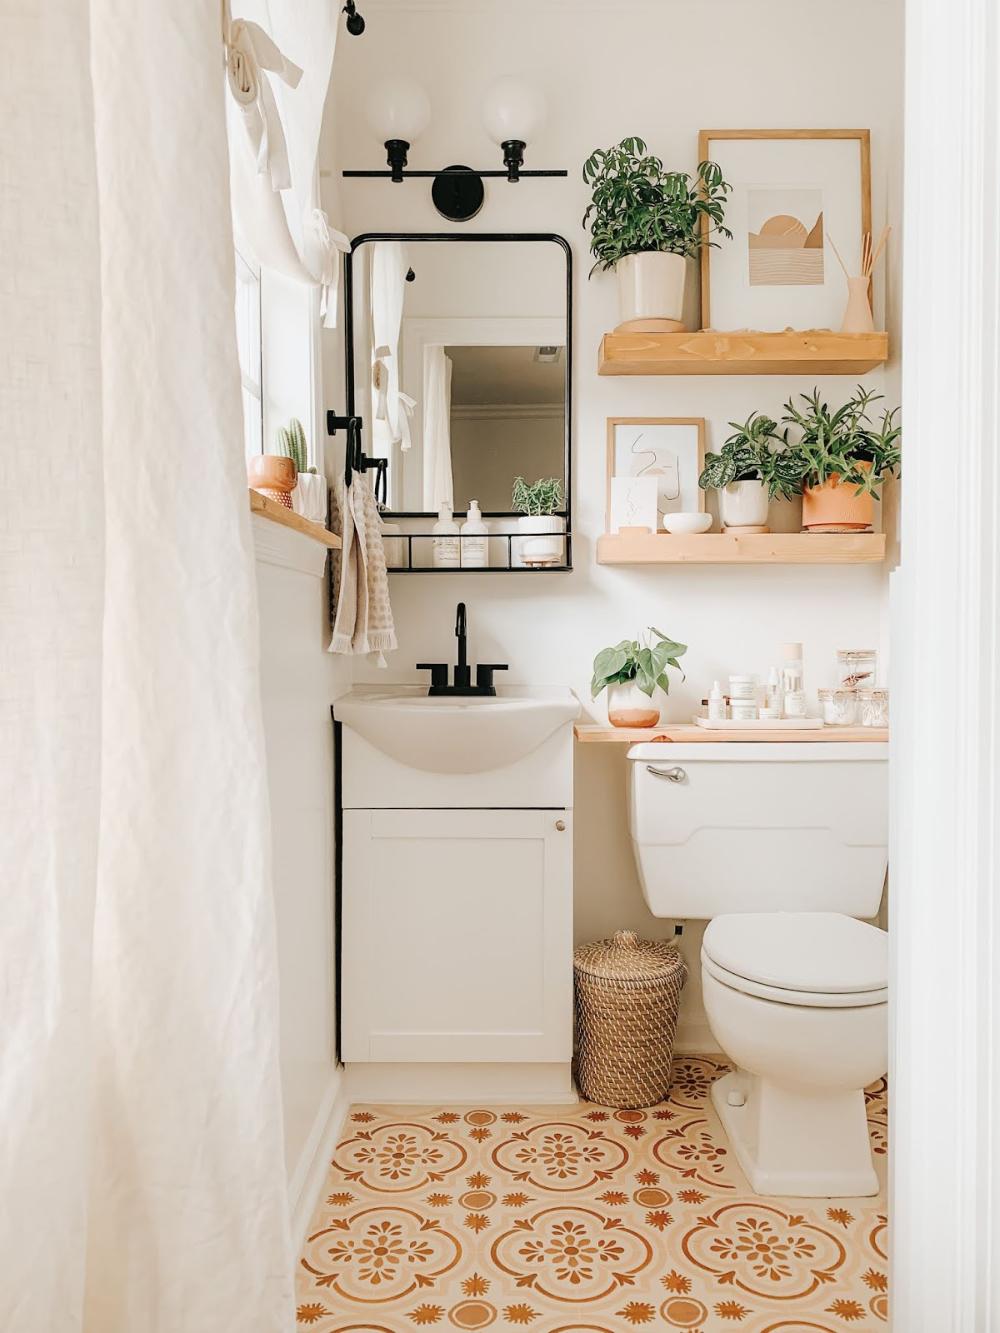 Thistle Harvest Stenciling My Bathroom Floor In 2020 Home Tiny Bathrooms Home Decor